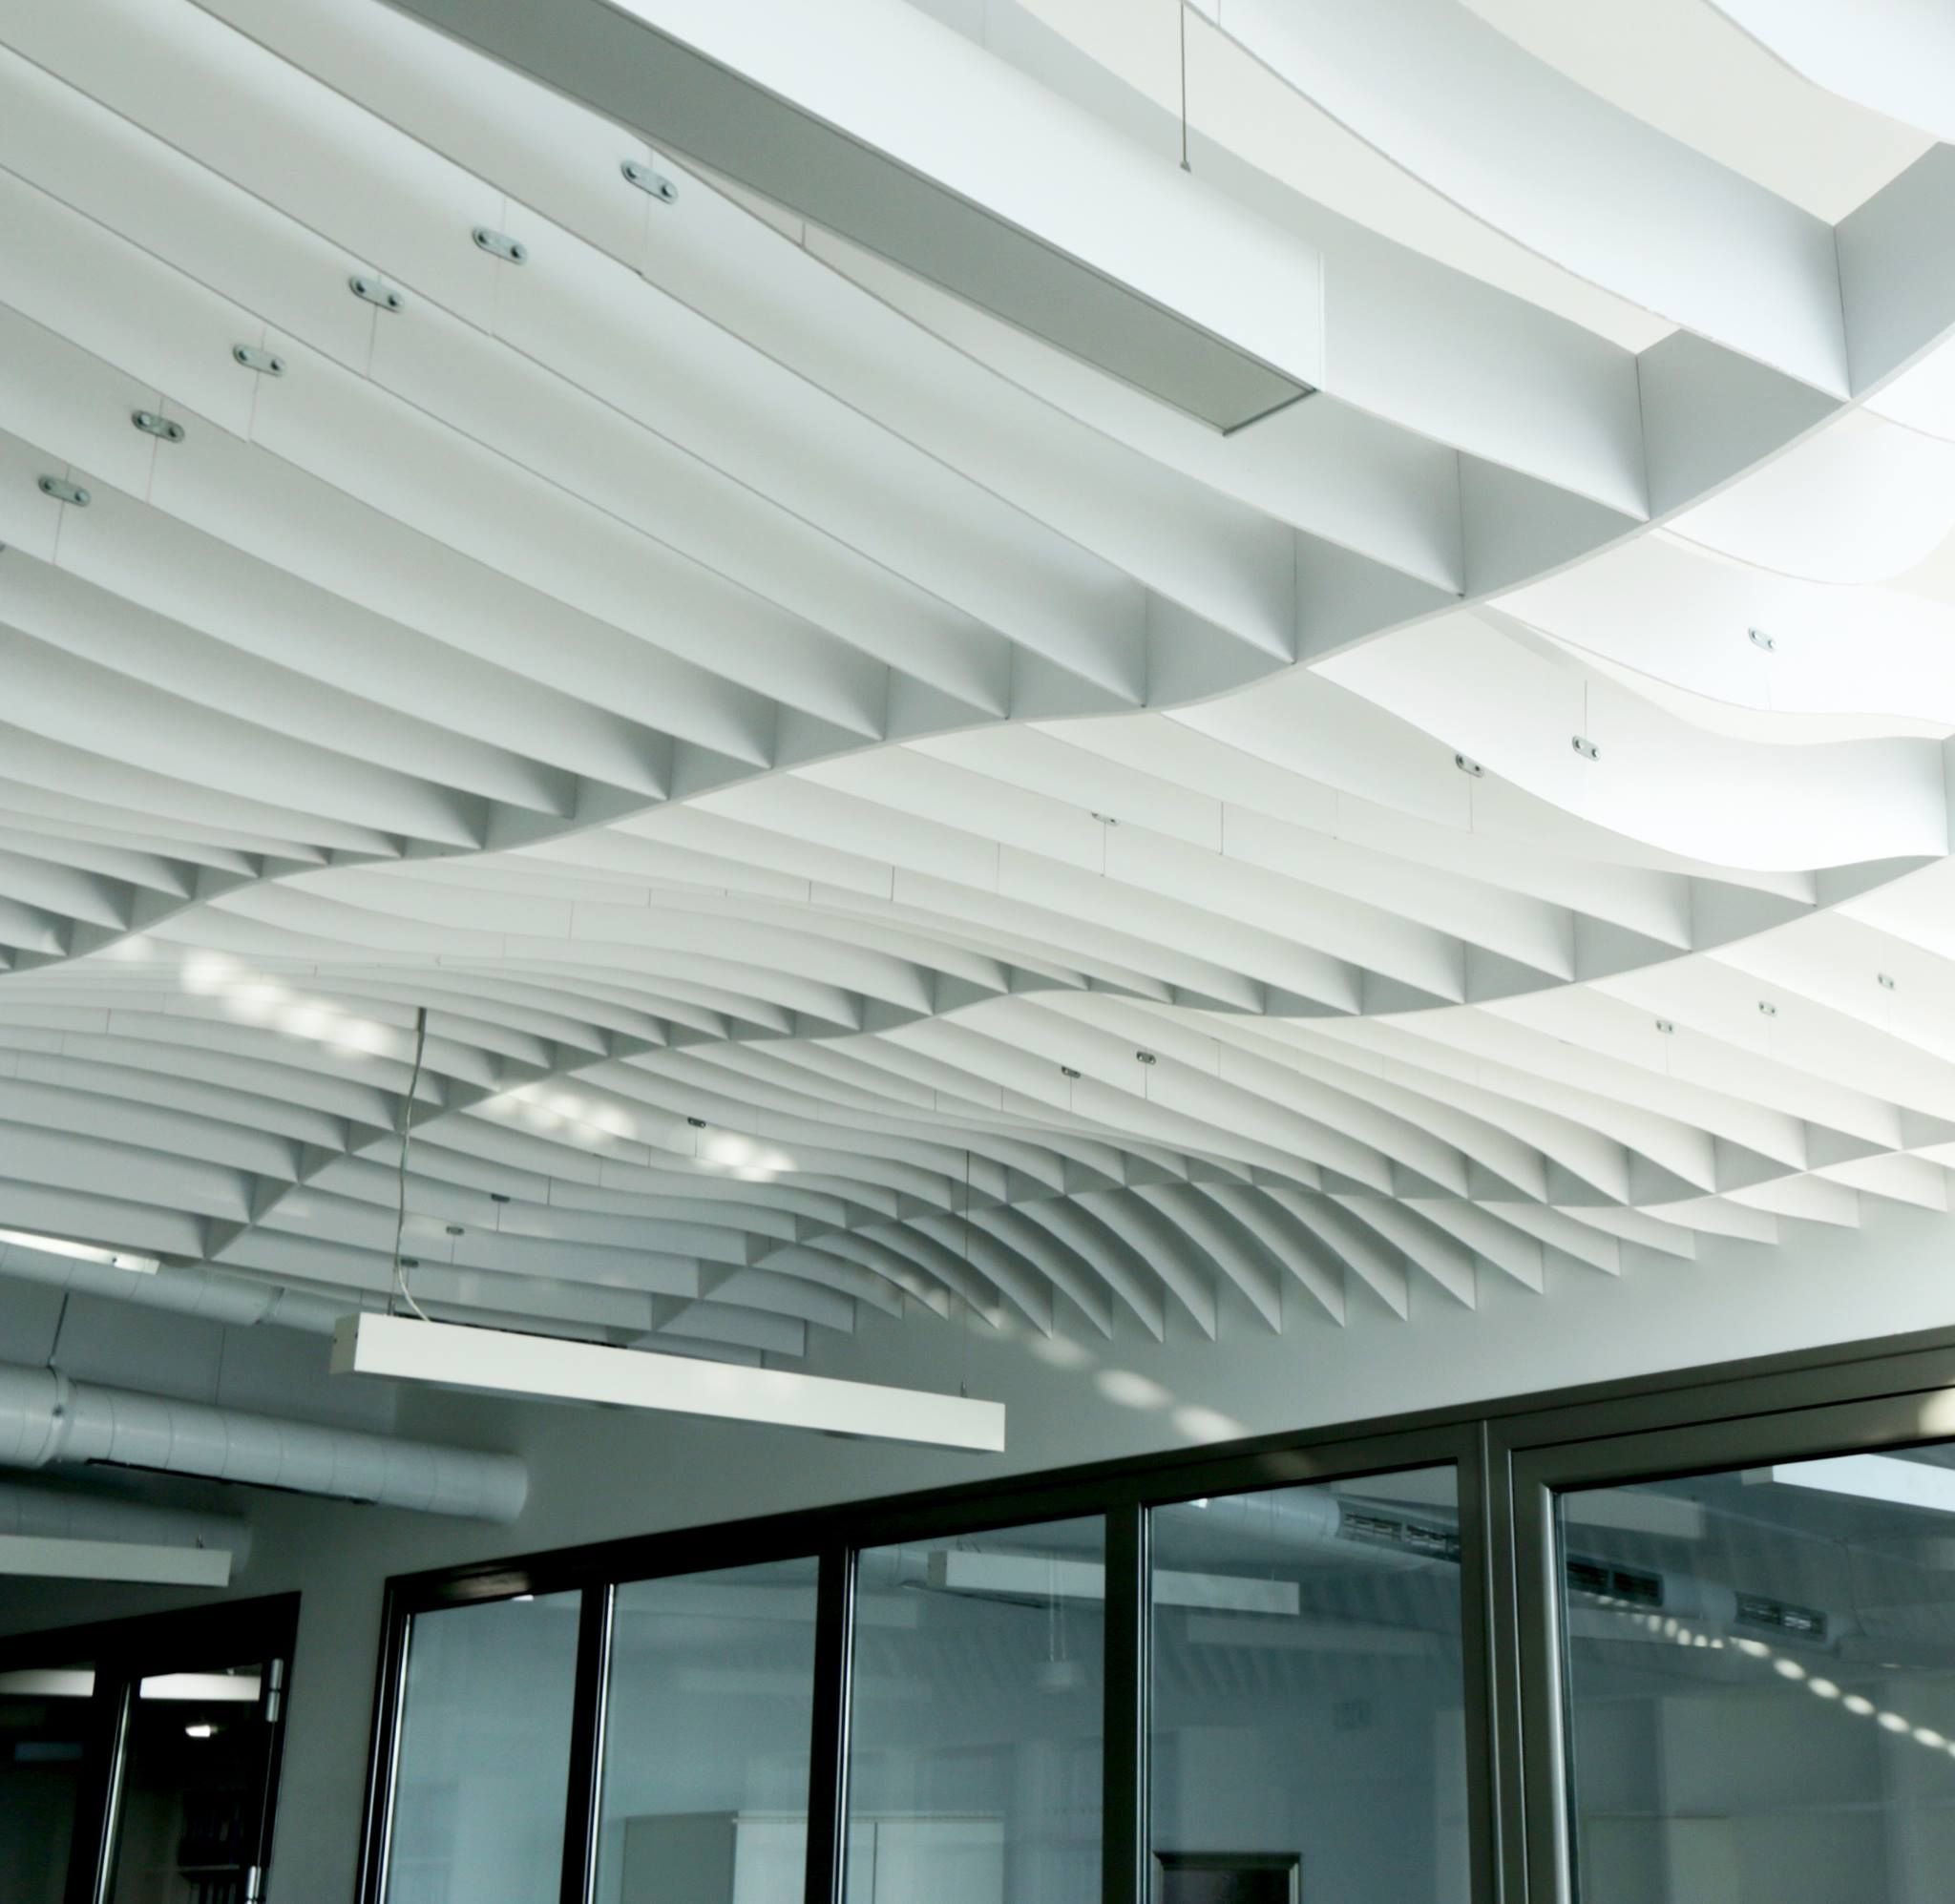 Parametric ceiling above office workspace, Sofia, Bulgaria